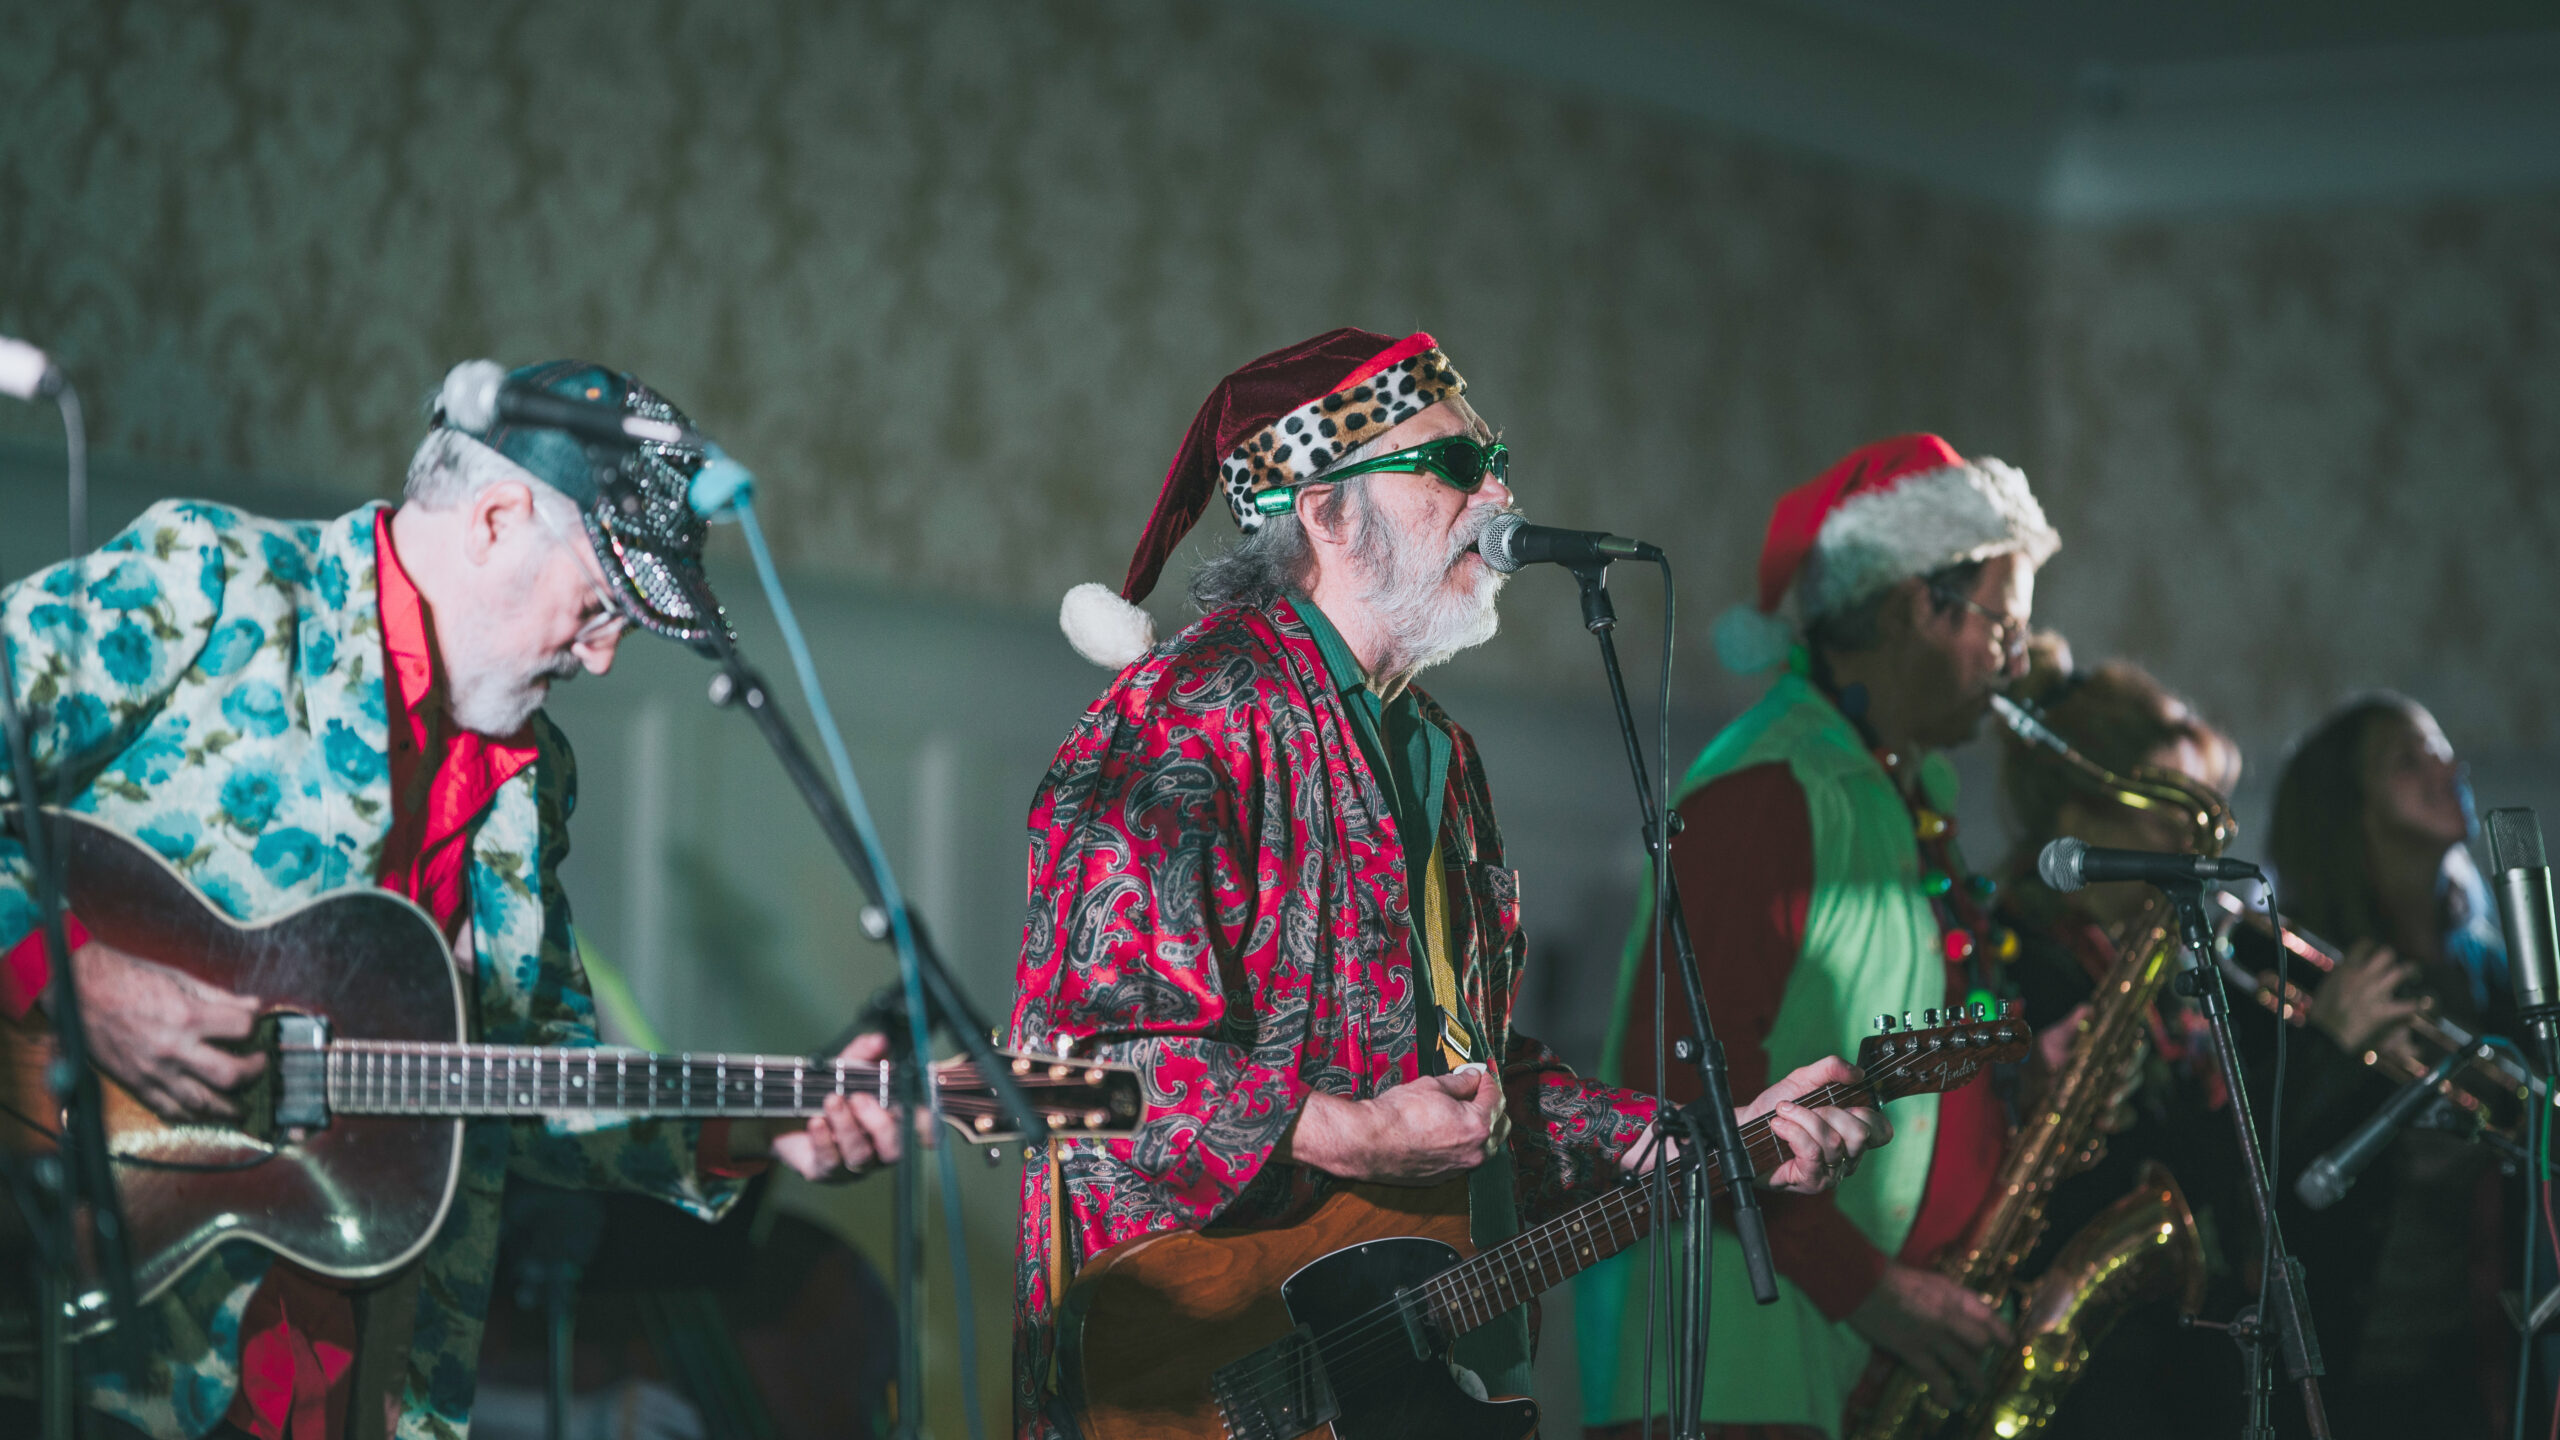 Cape Cod Christmas Cavalcade for the Homeless